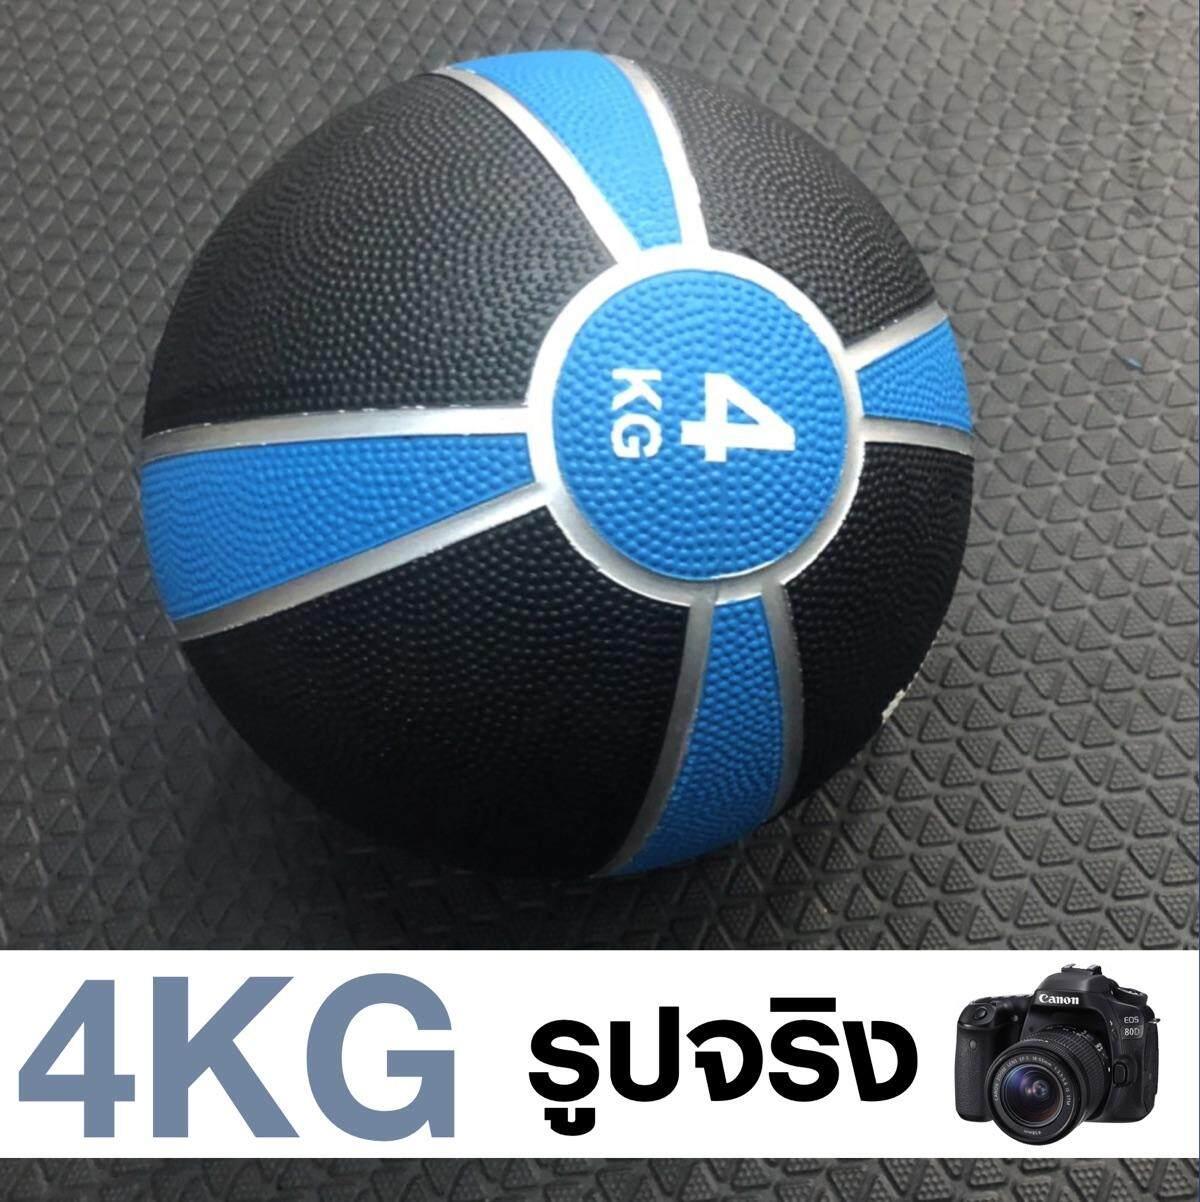 Medicine Ball เมดิซินบอล ลูกบอลน้ำหนัก 4 Kg (blue) By Zoo Fitness.